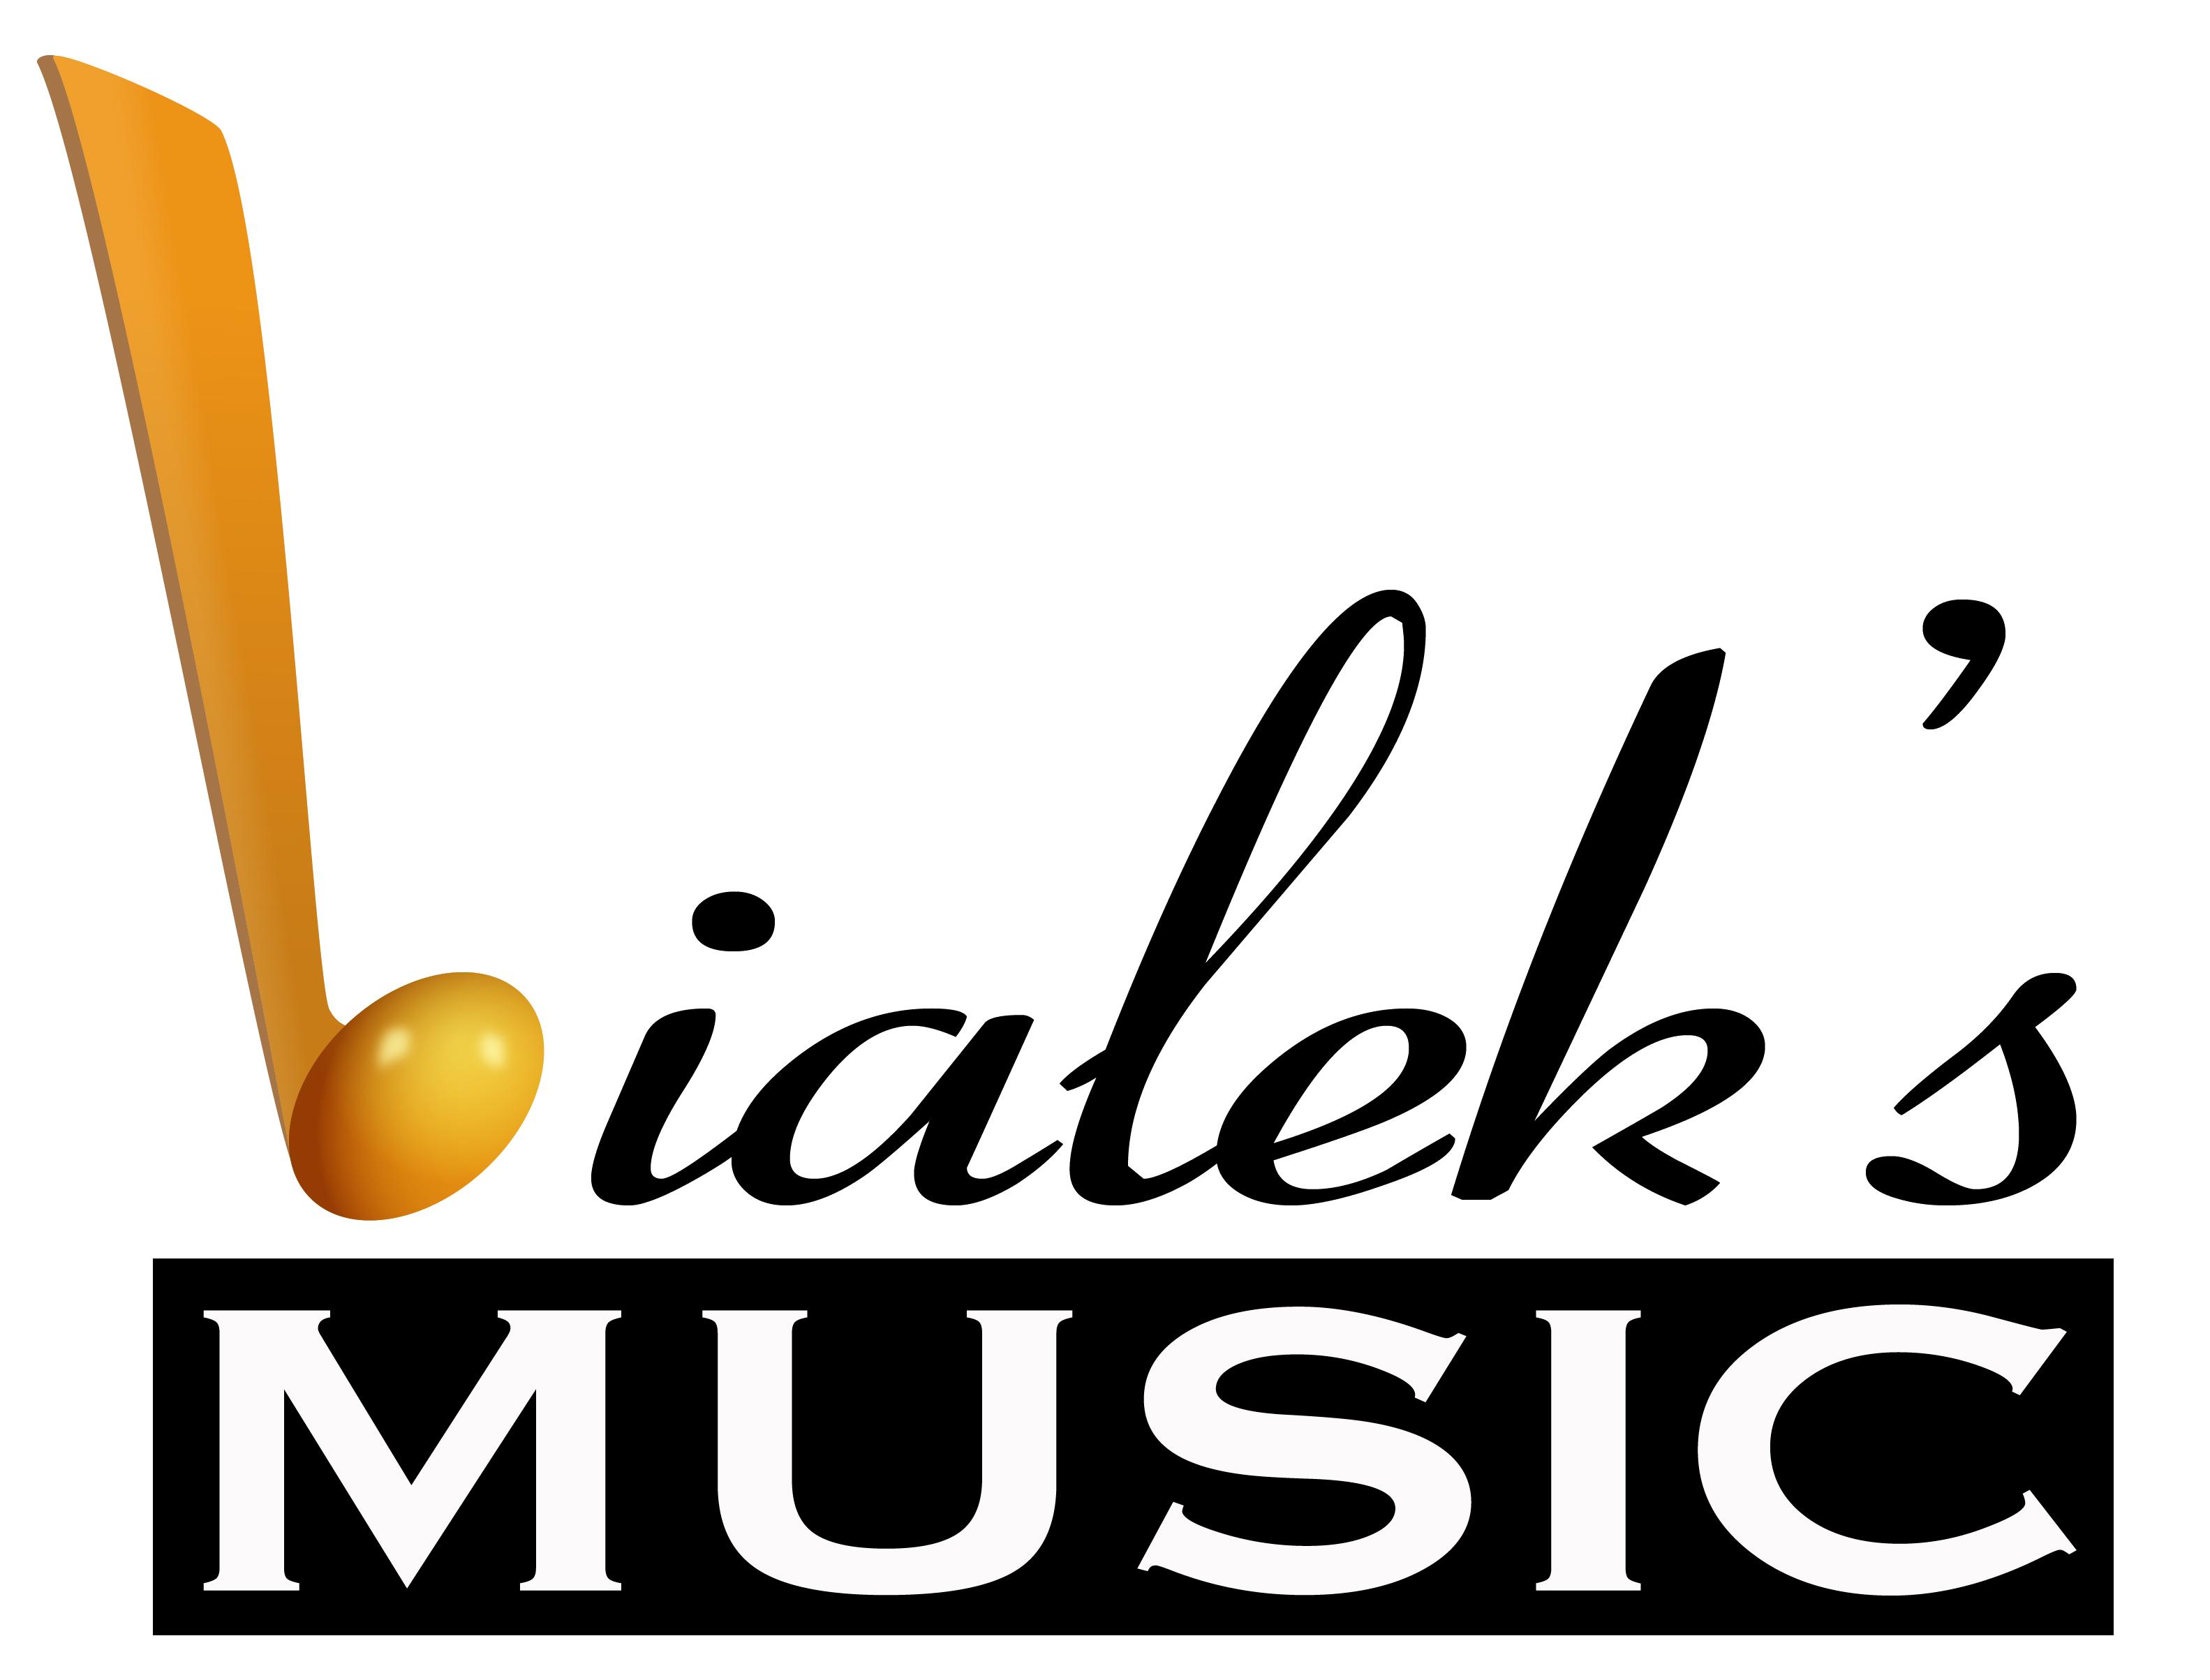 Bialek's Music